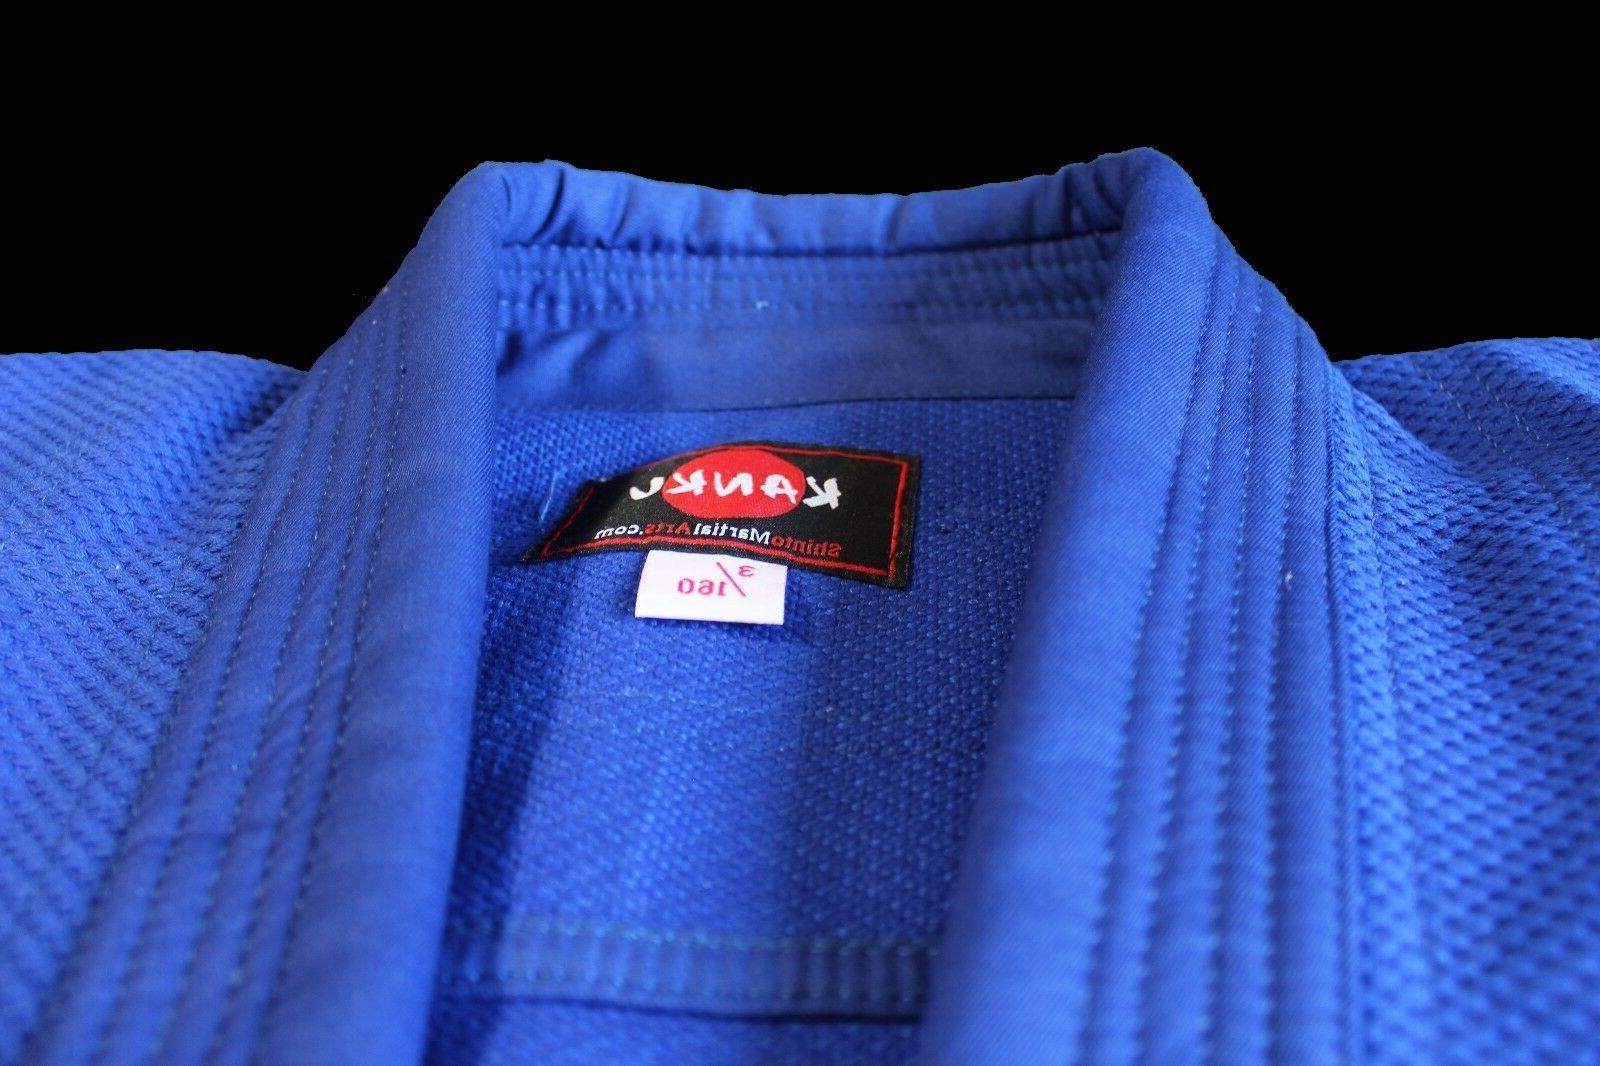 KANKU Bjj gi, Judo Uniform, Single Weave Blue color Jiu Jiut